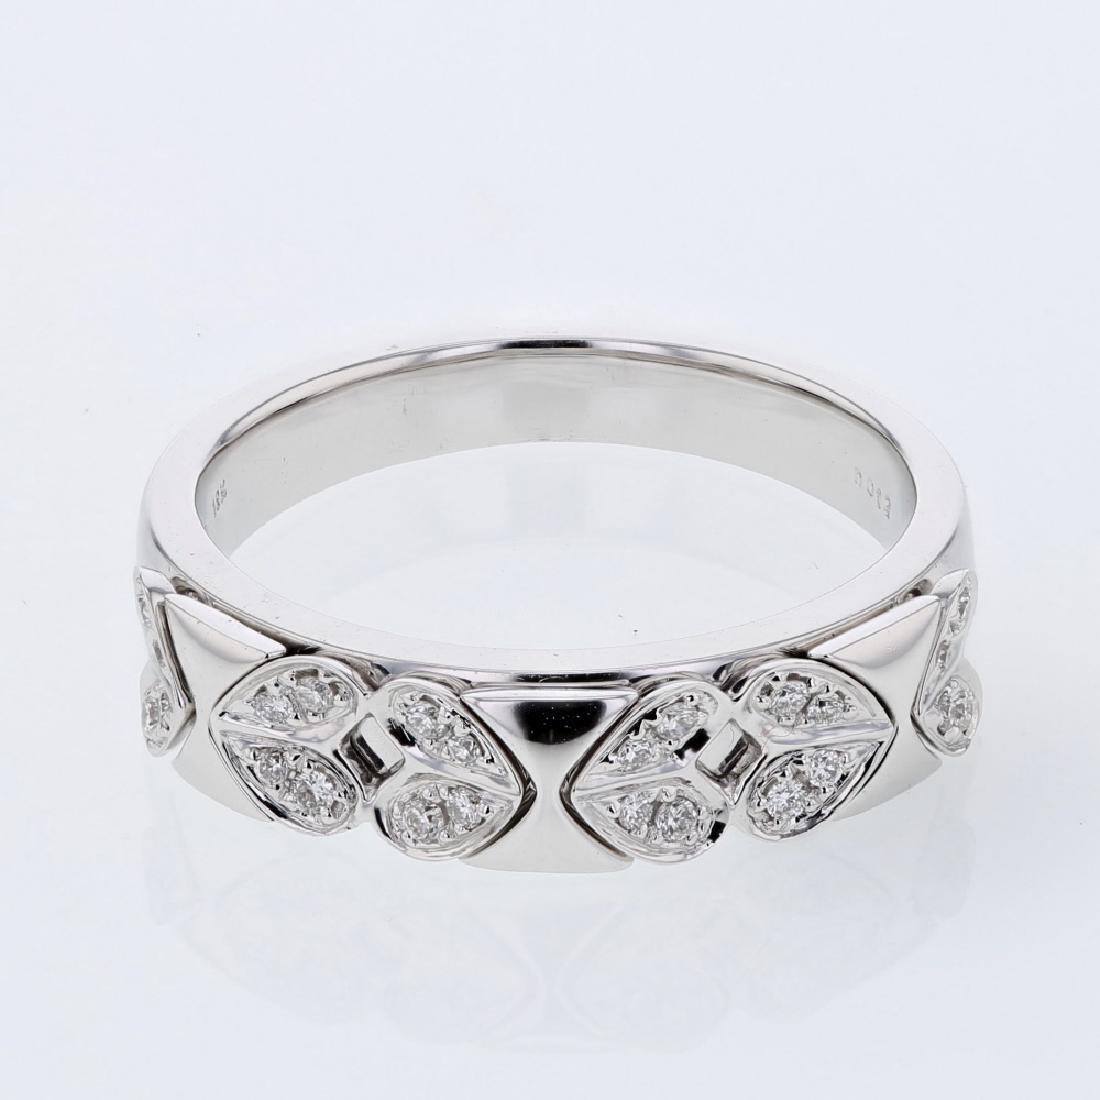 0.12CTW Diamond Ring in 18K White Gold